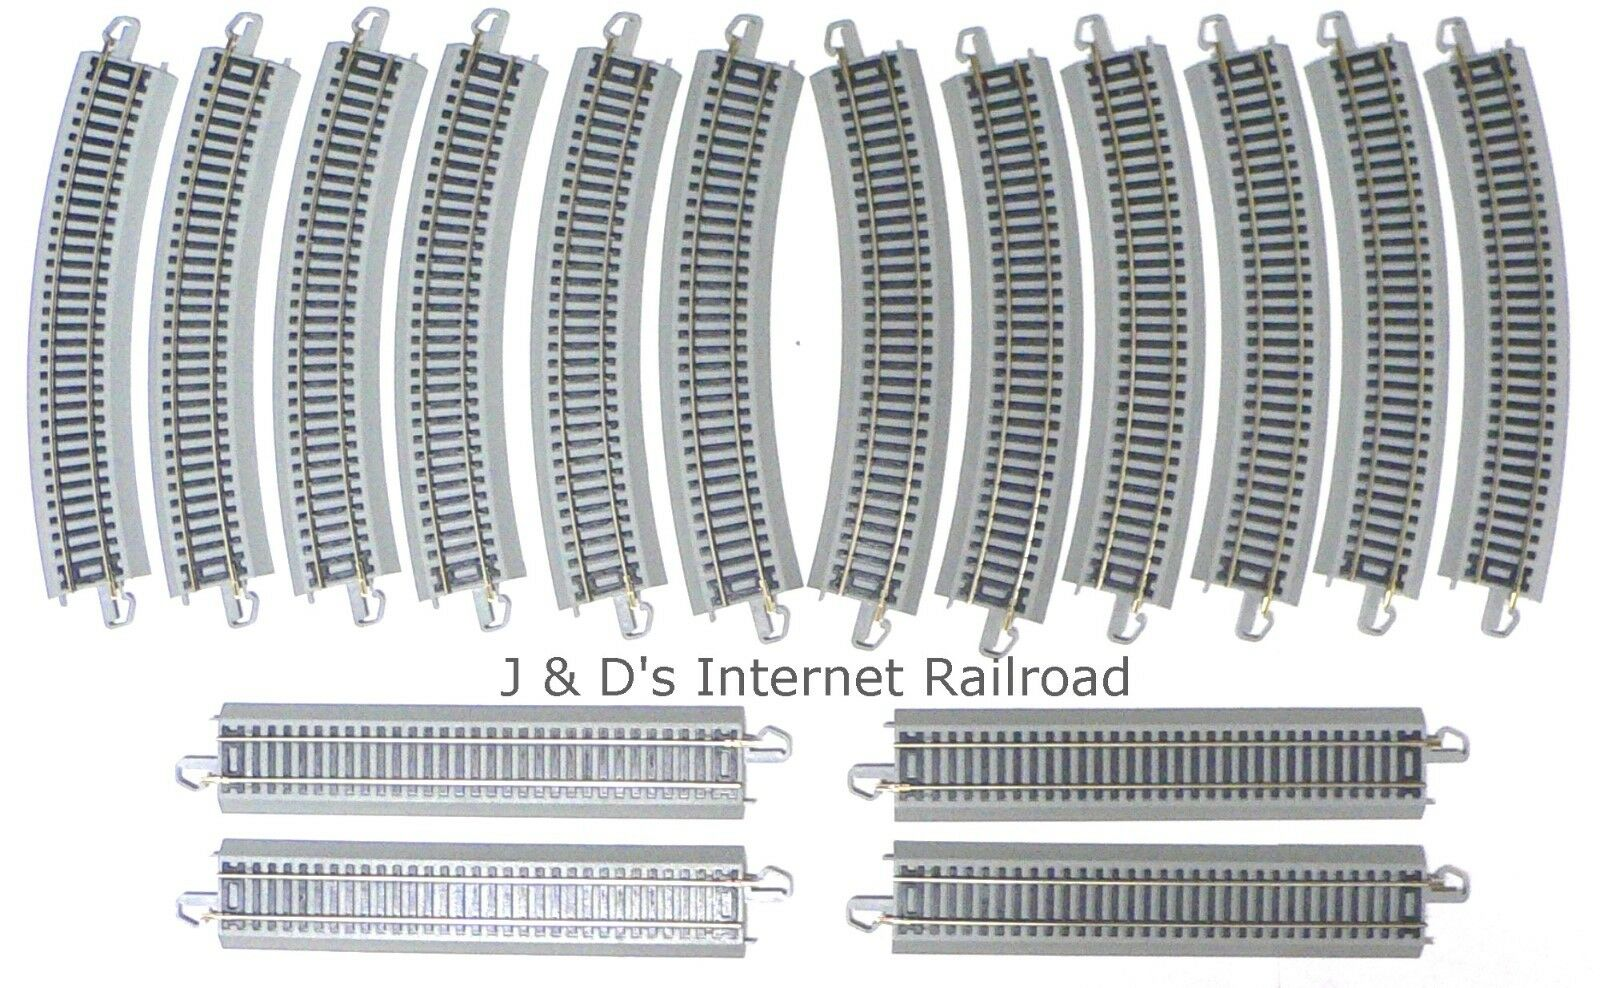 Bachmann EZ Track Silver 38 X 56 Oval Lot HO Scale Model Railroad Trains Layout